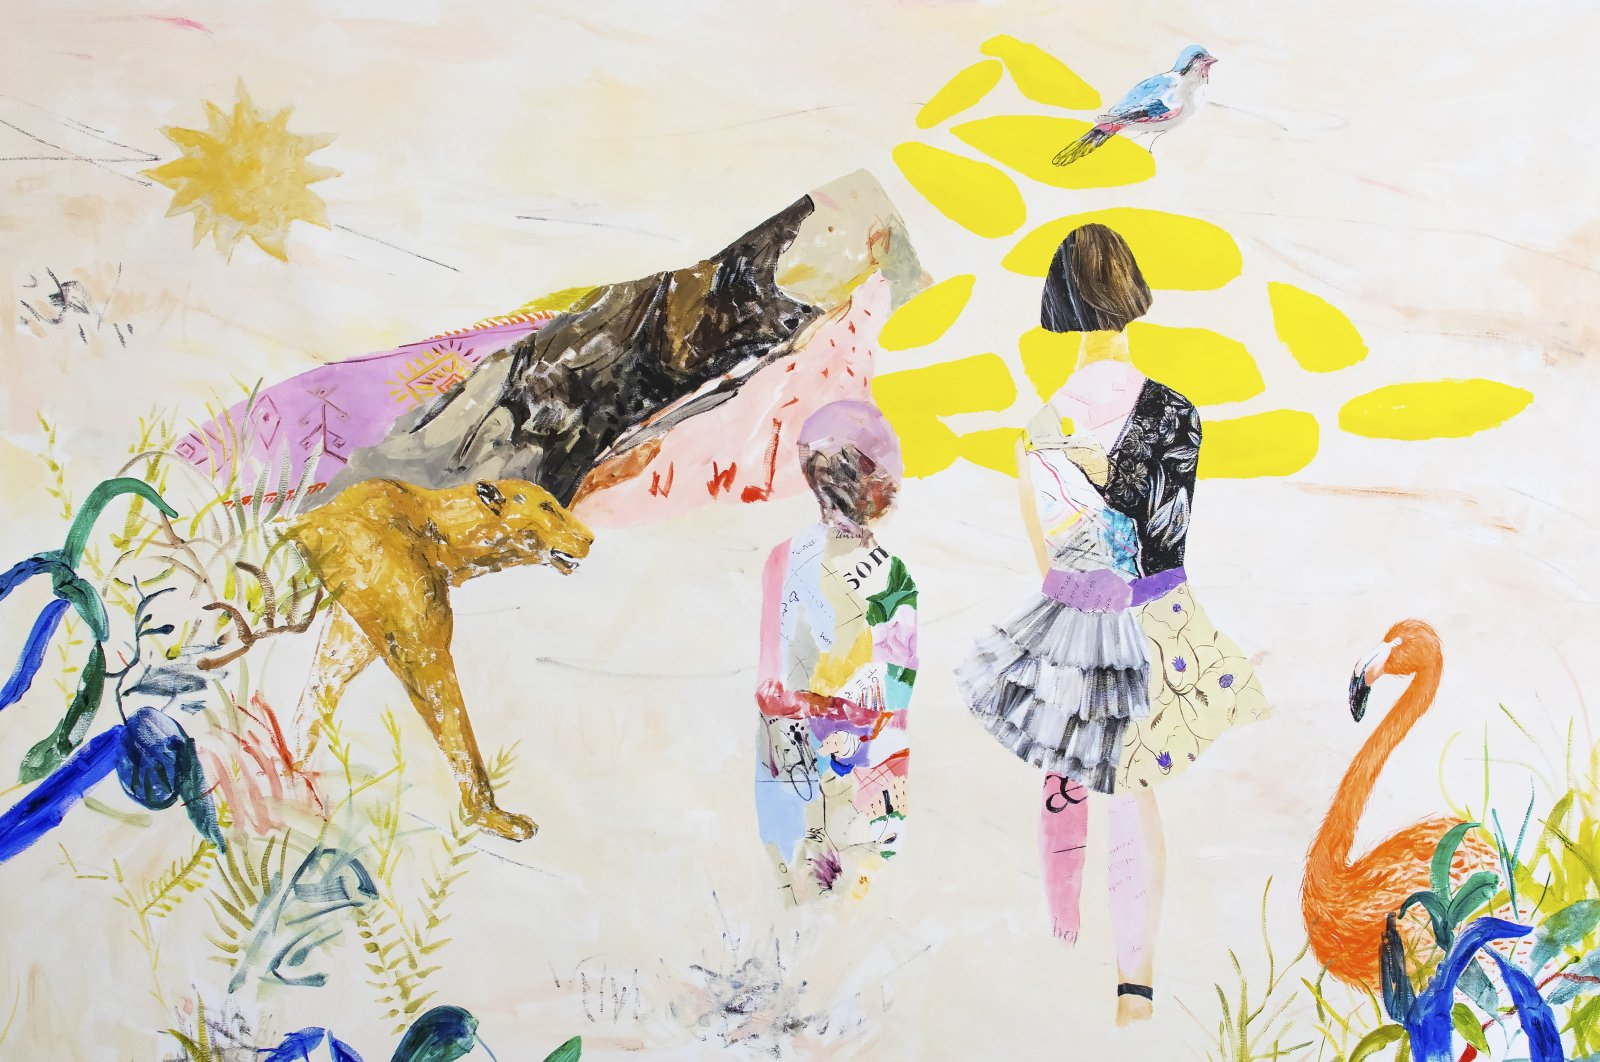 "Ekin Su Koç, ""Corrected Storytelling"", oil on canvas, 200 by 150 centimeters, 2020. (Courtesy of Anna Laudel)"